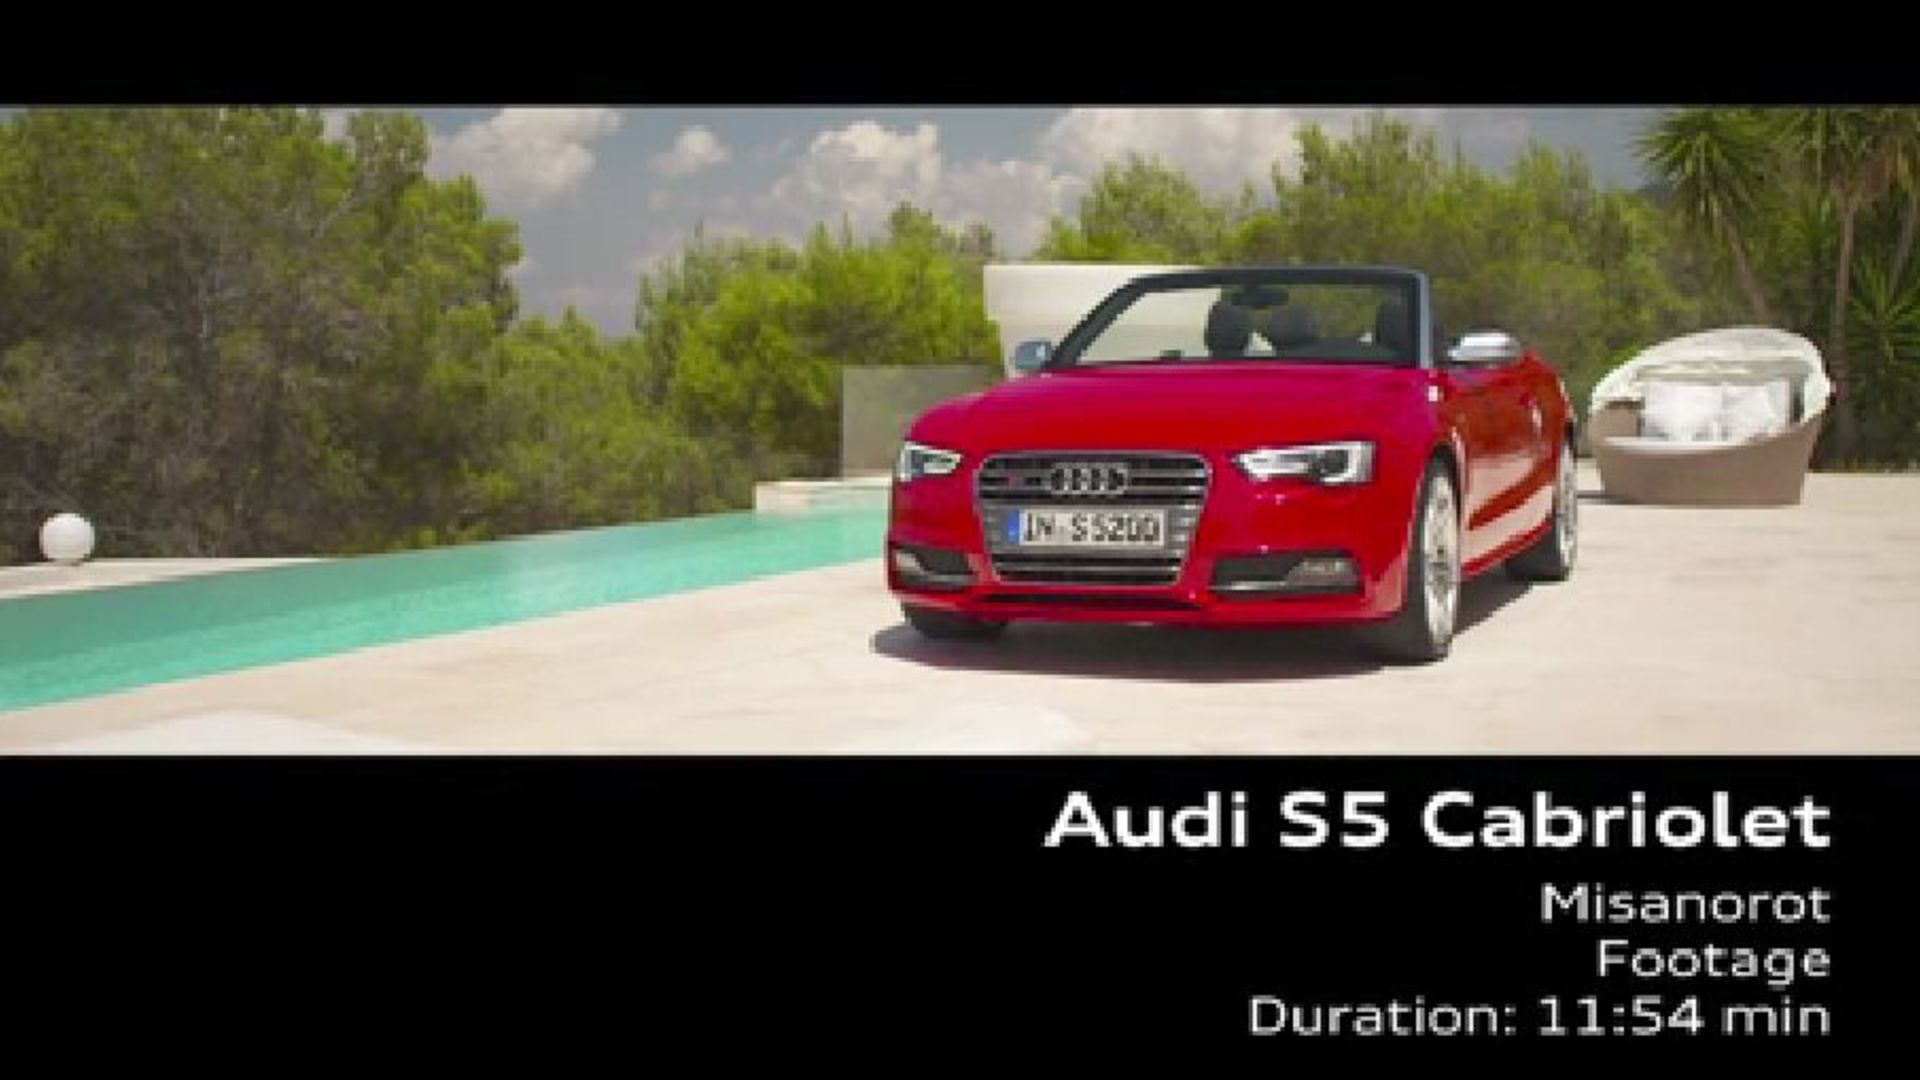 Audi S5 Cabriolet - Footage